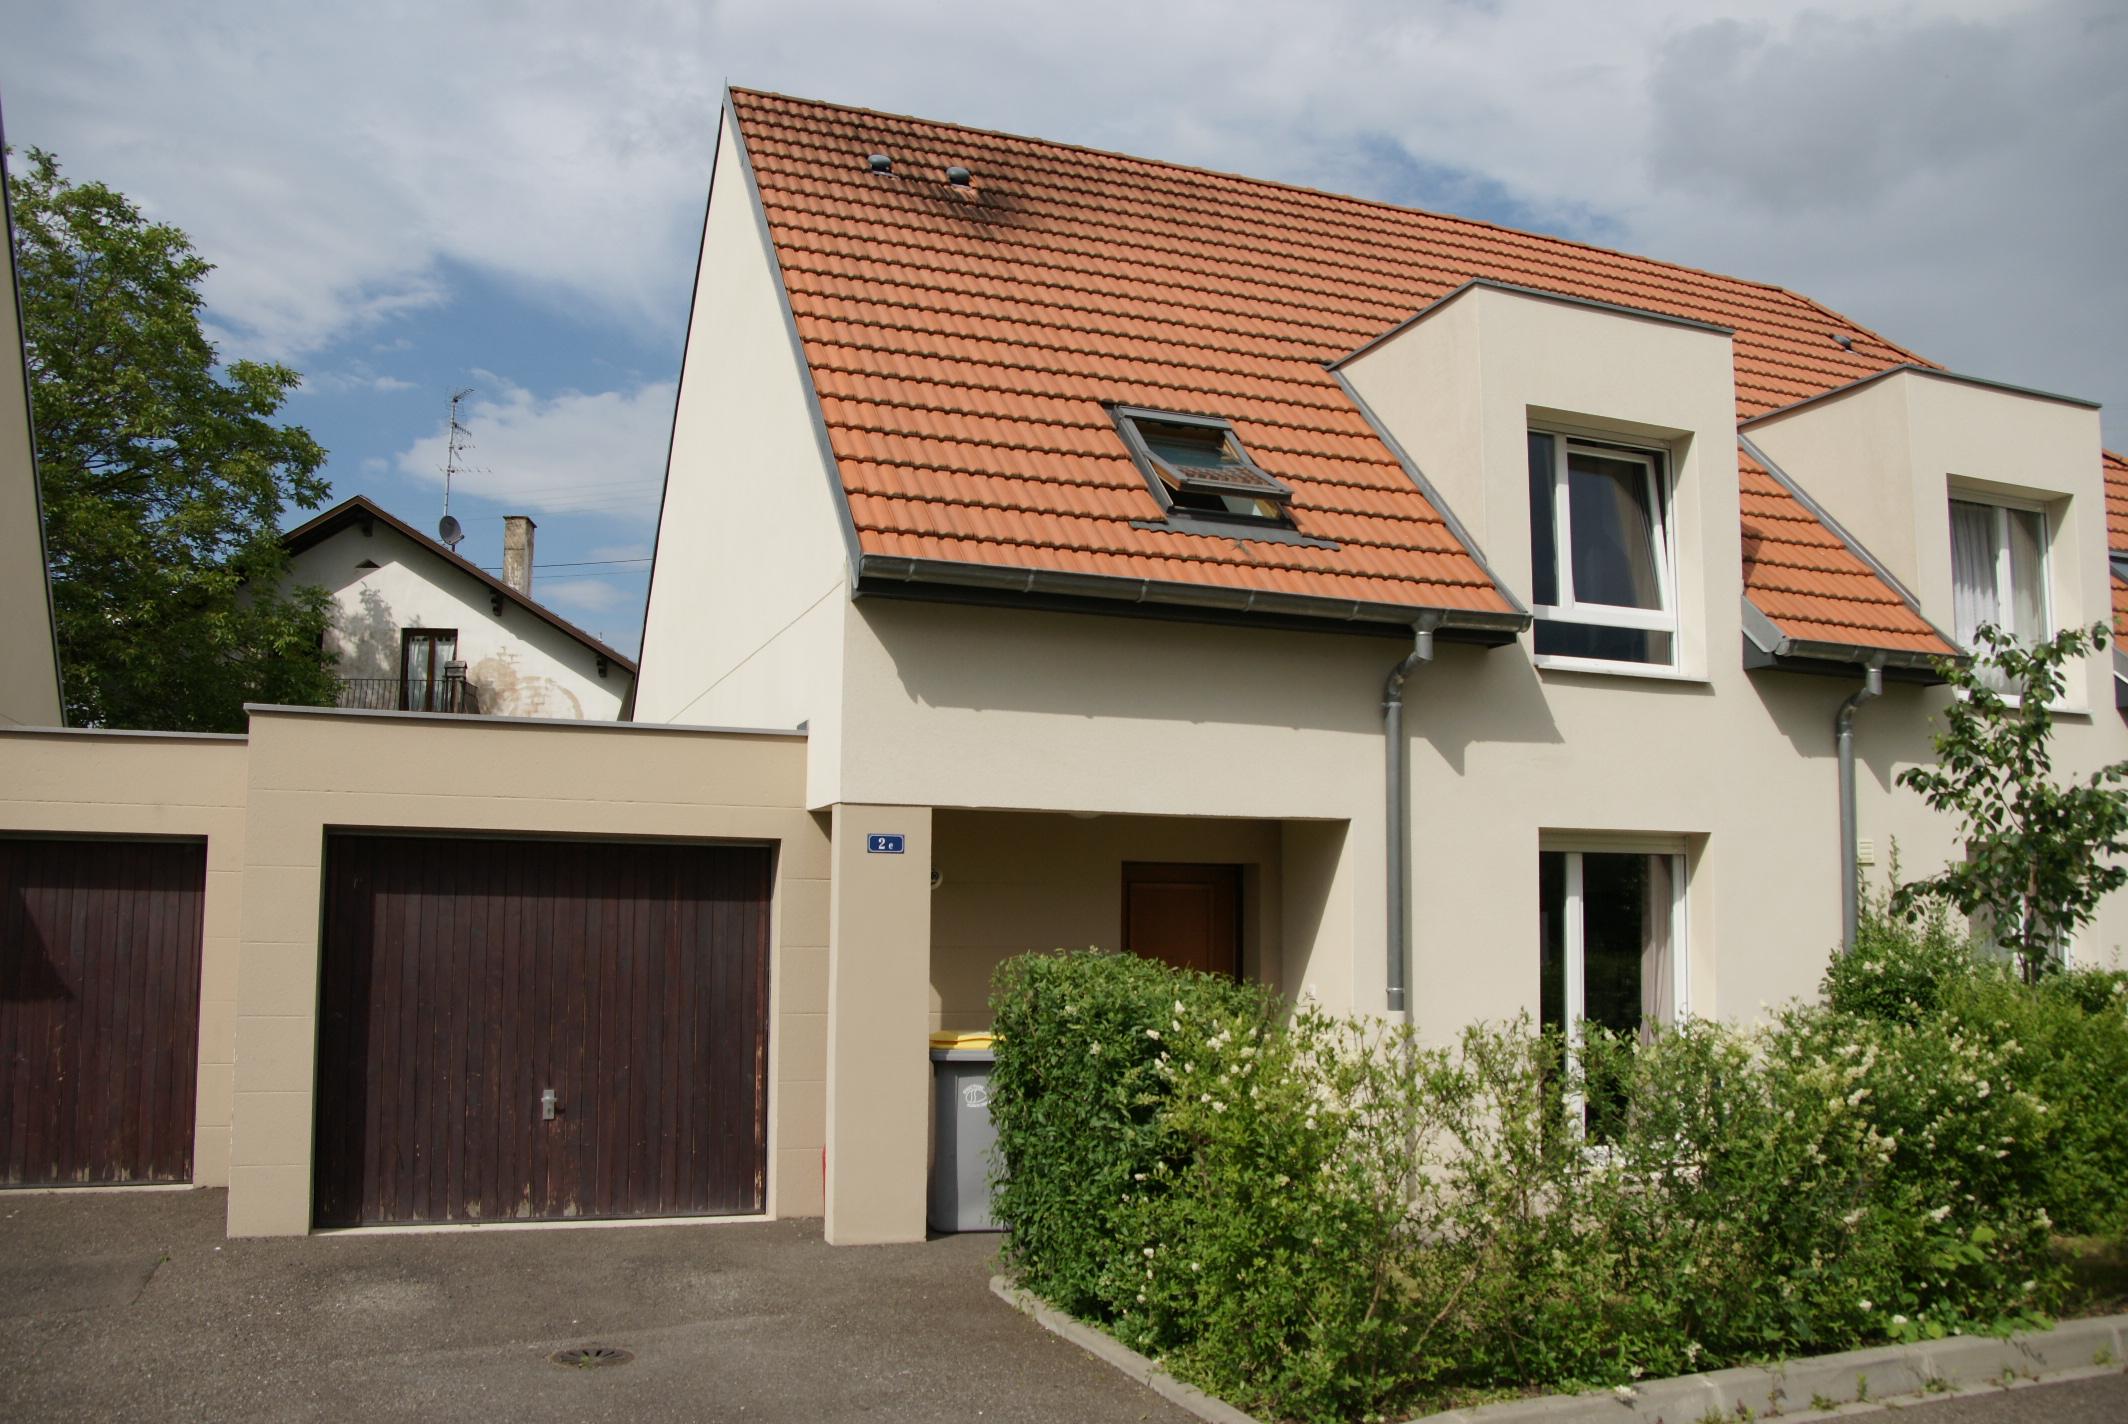 Vente maison bas rhin selestat - Leboncoin bas rhin immobilier ...